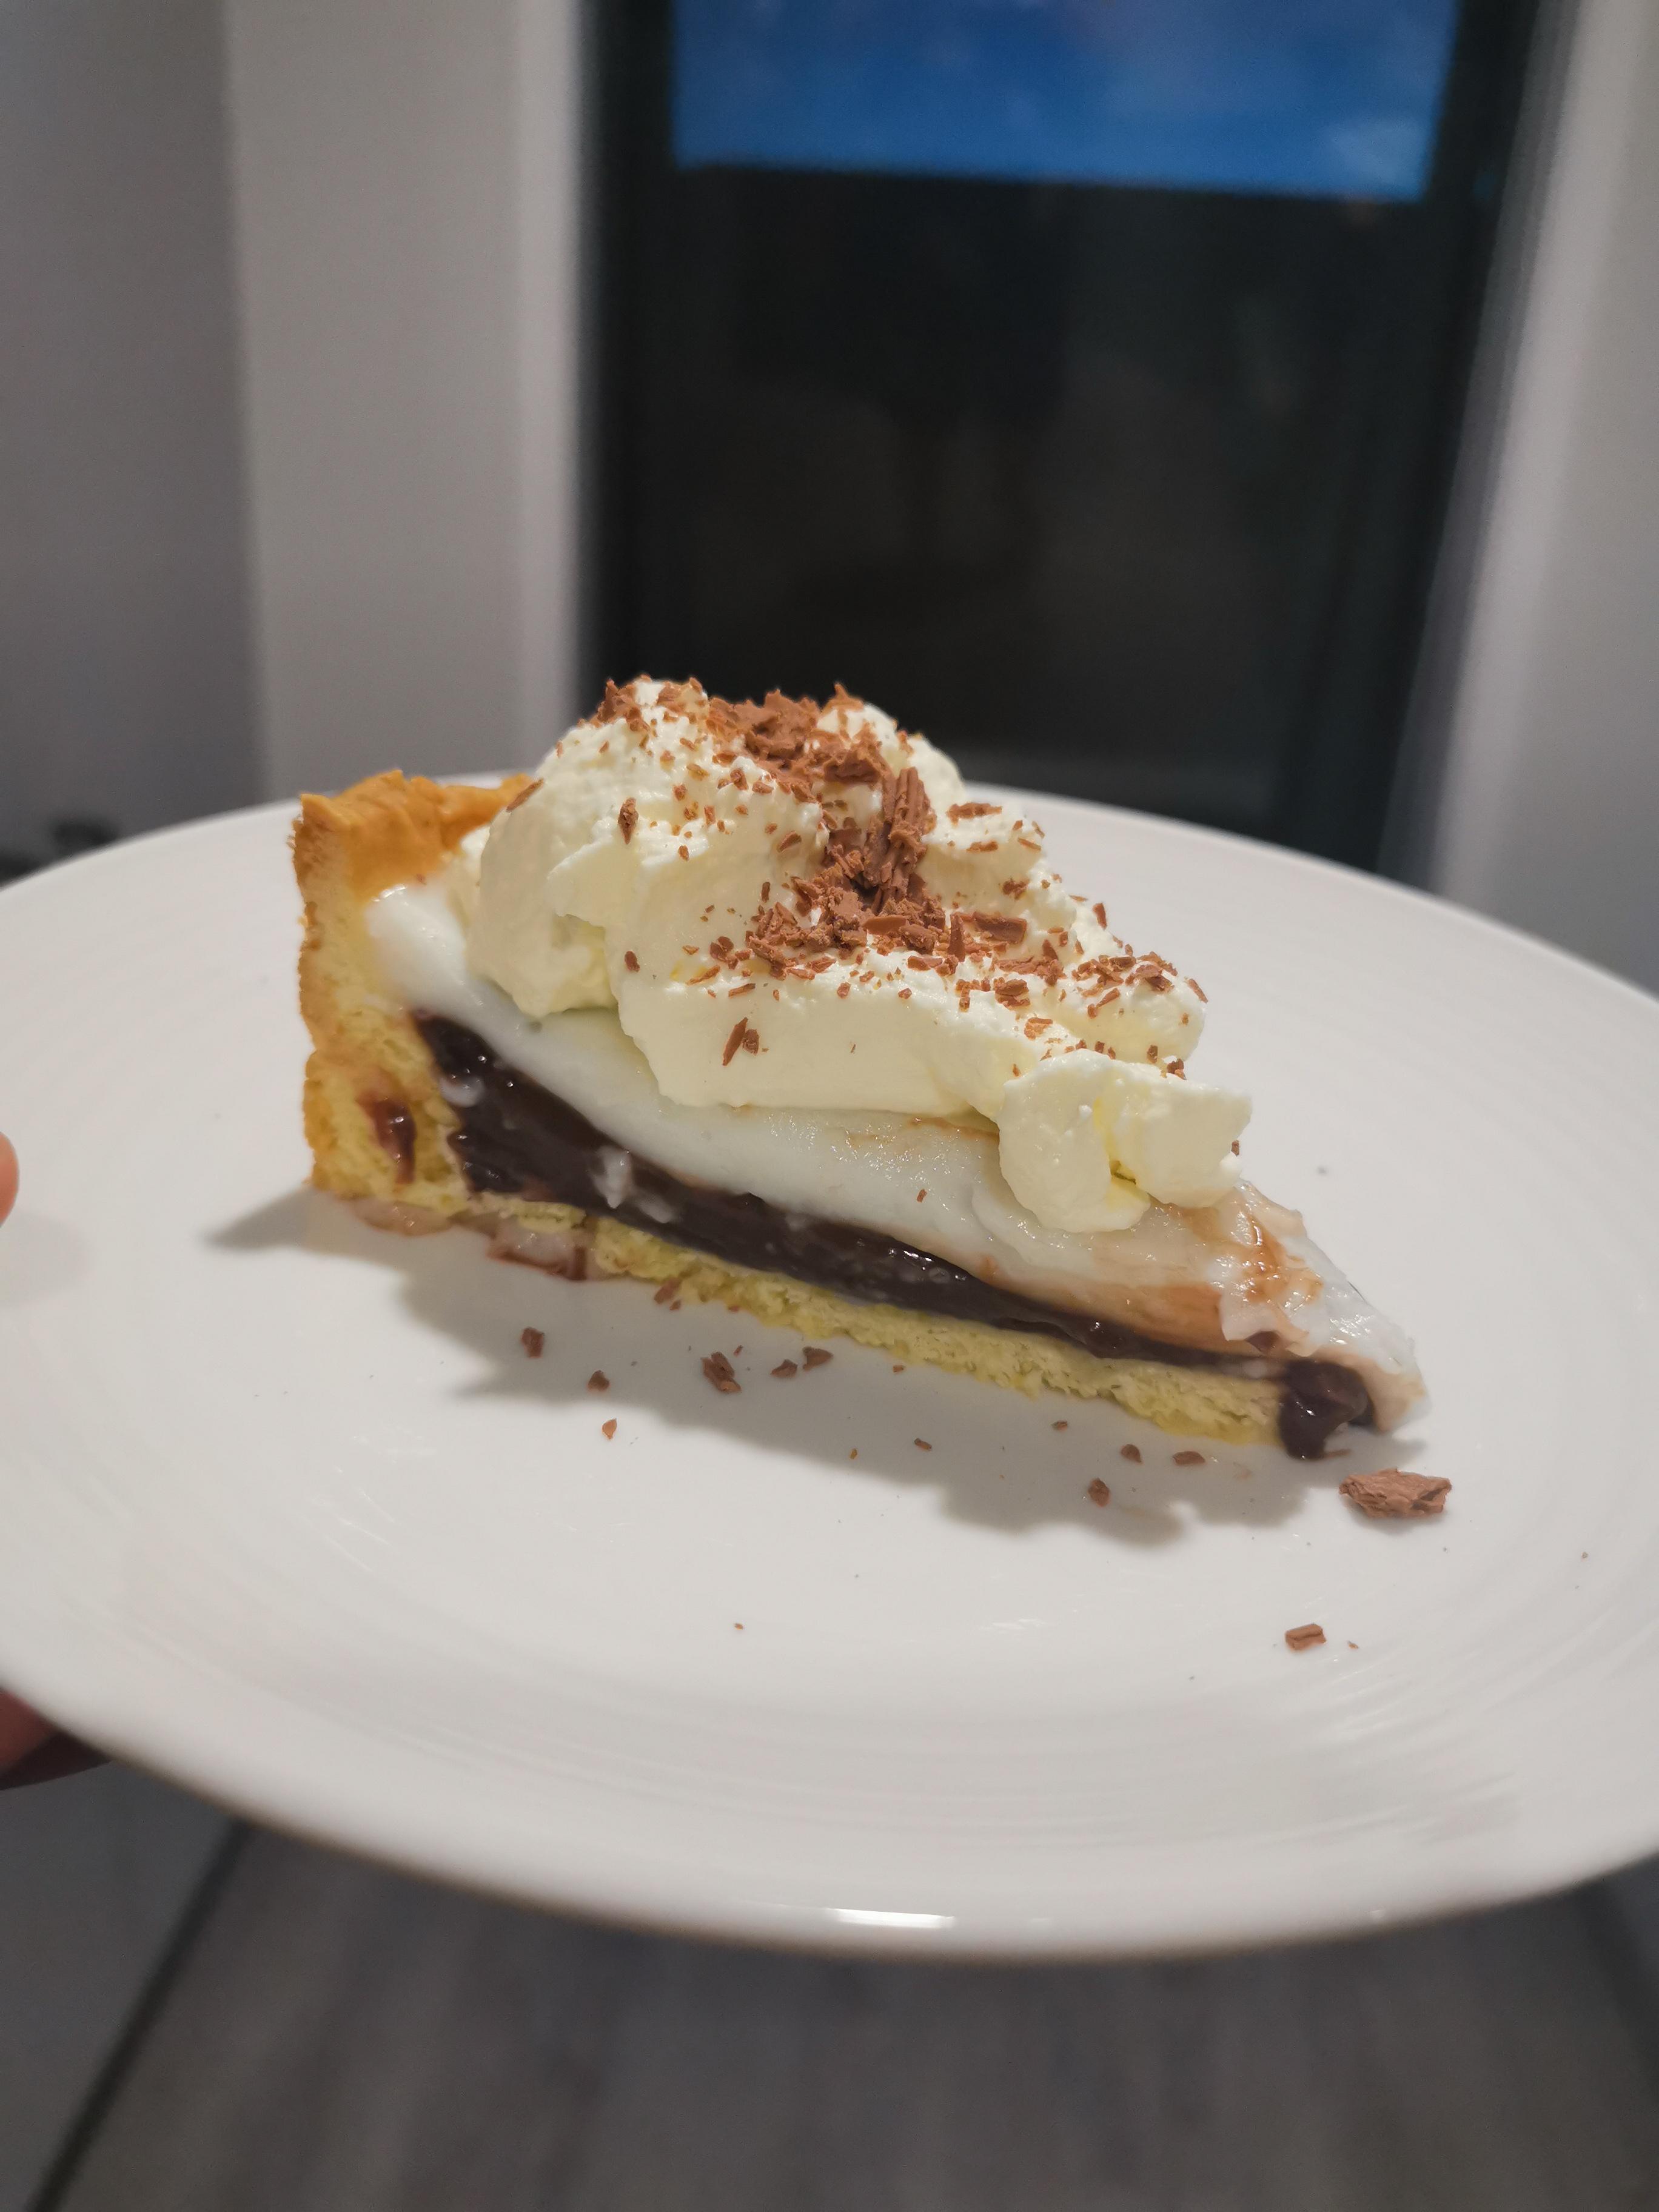 Coconut (Haupia) and Chocolate Pie